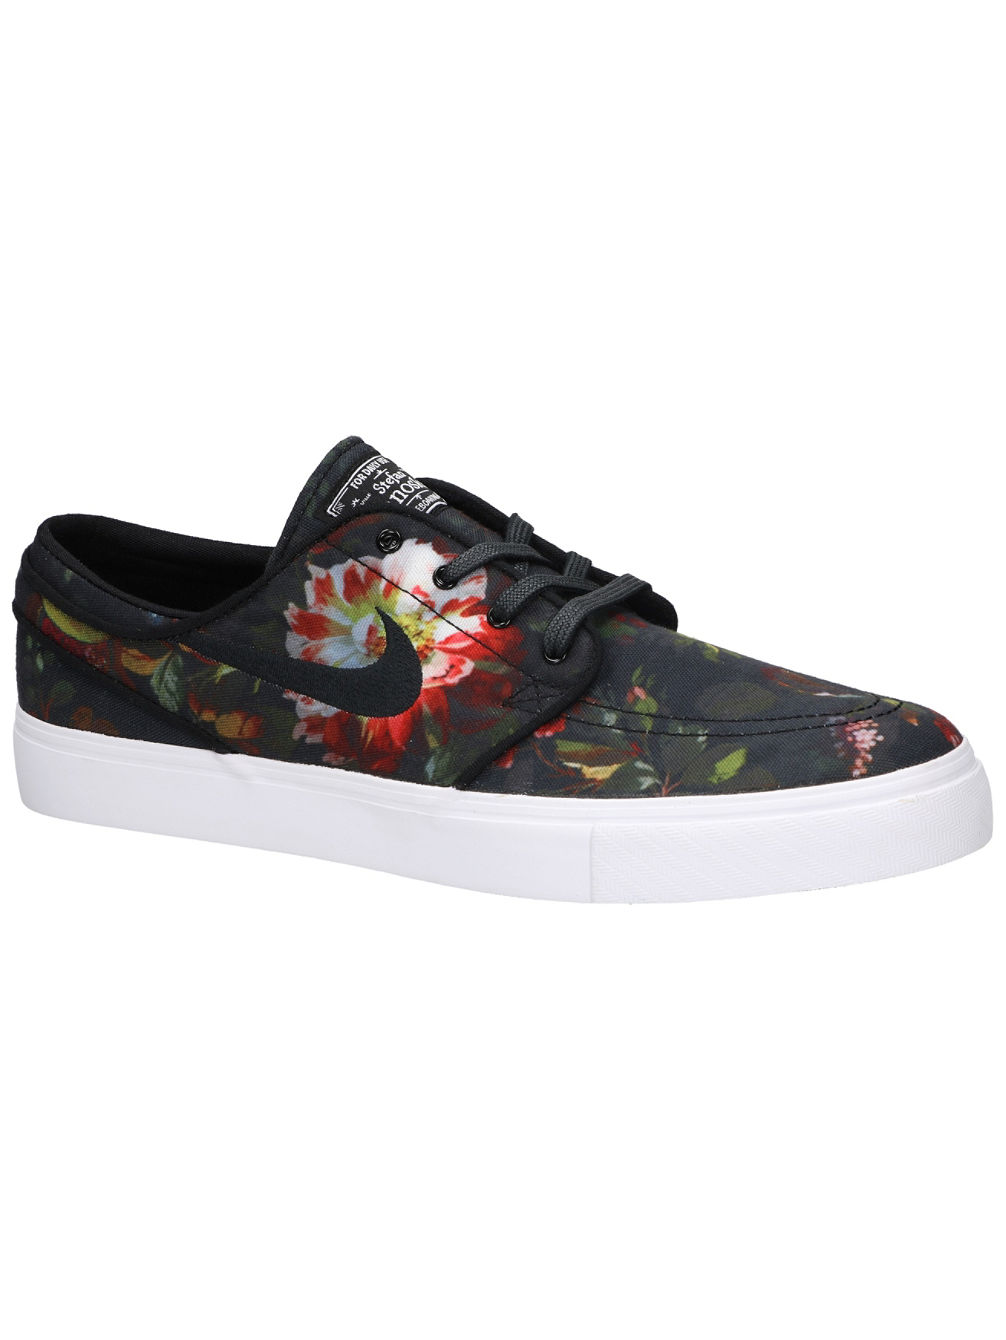 0bec58cbd8f9 Buy Nike Zoom SB Stefan Janoski Skate Shoes online at Blue Tomato